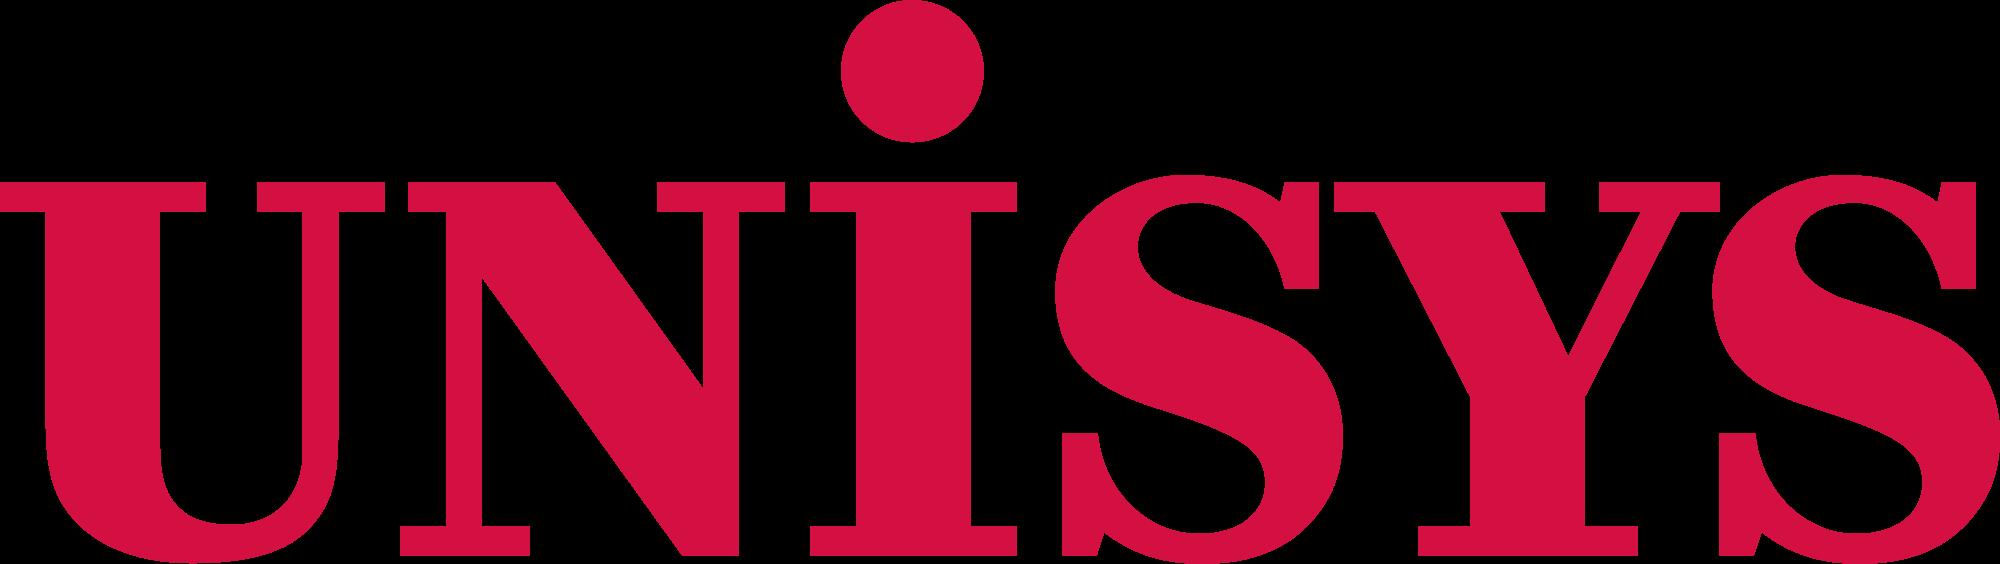 unisys logo.png